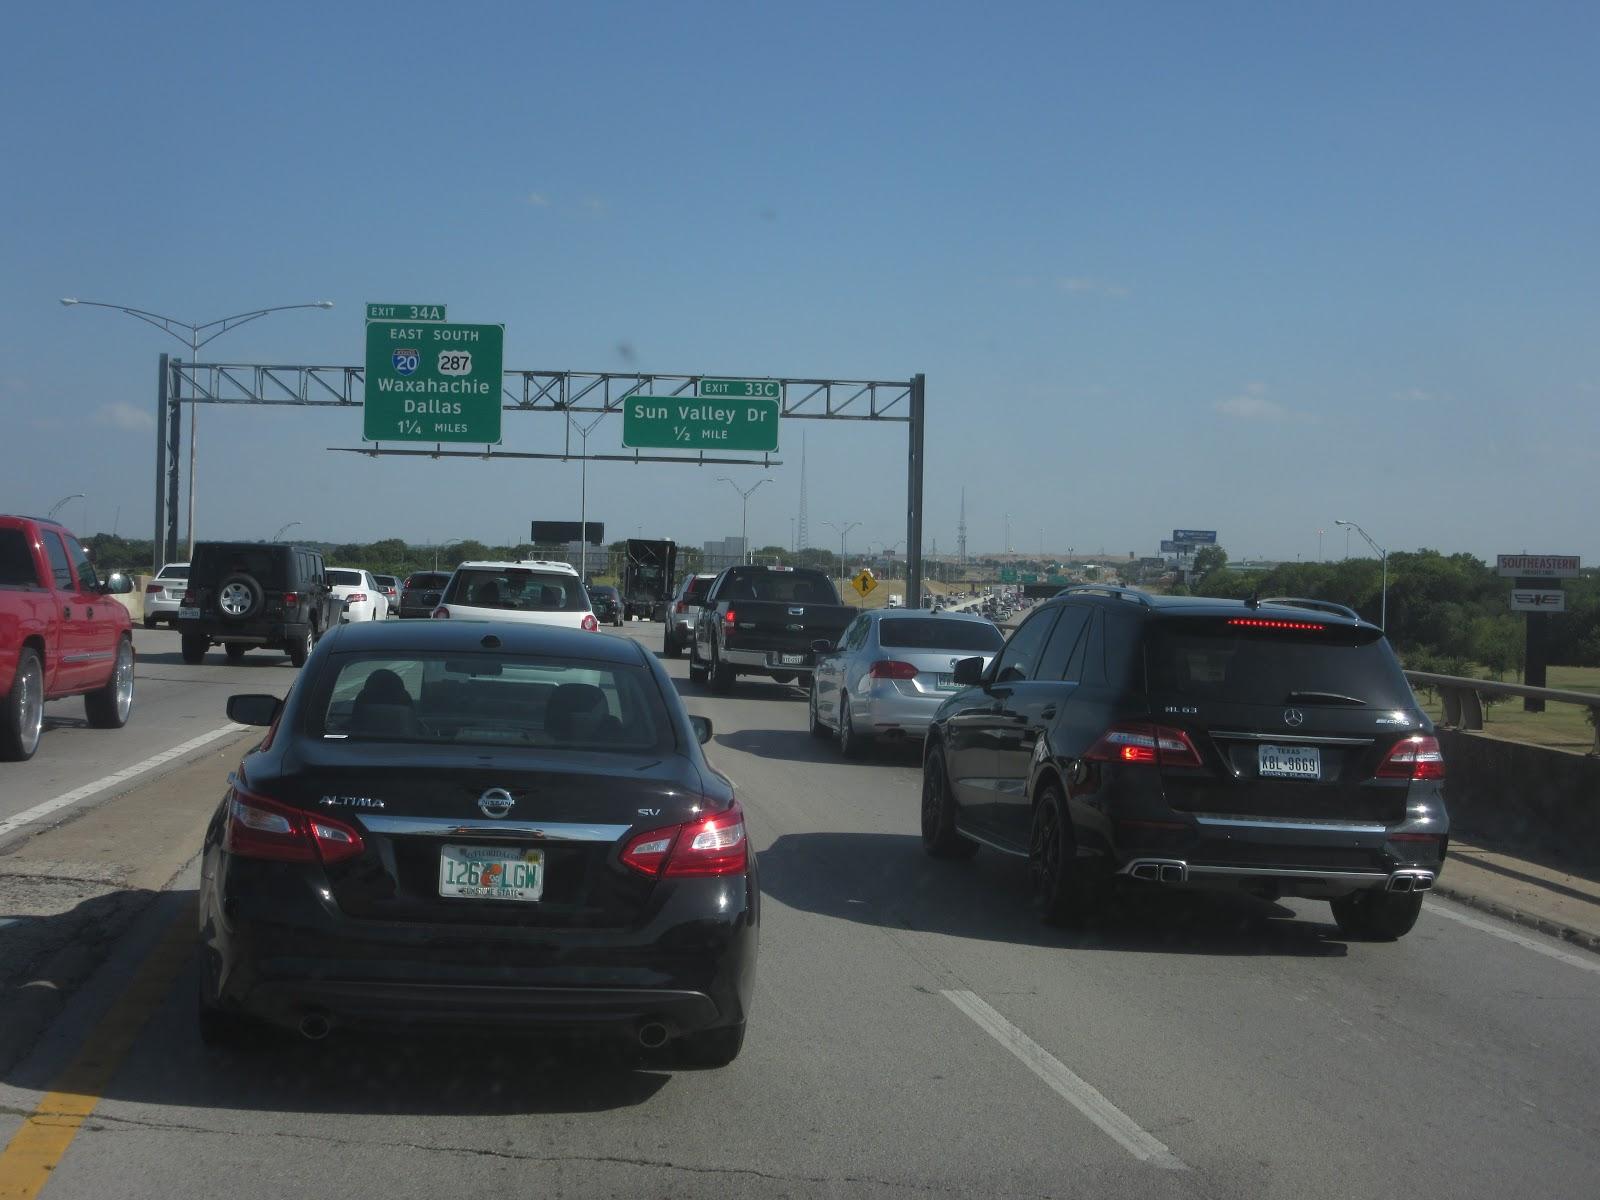 Louisiana Gulf Coast March 13 | Roadtrek Travels